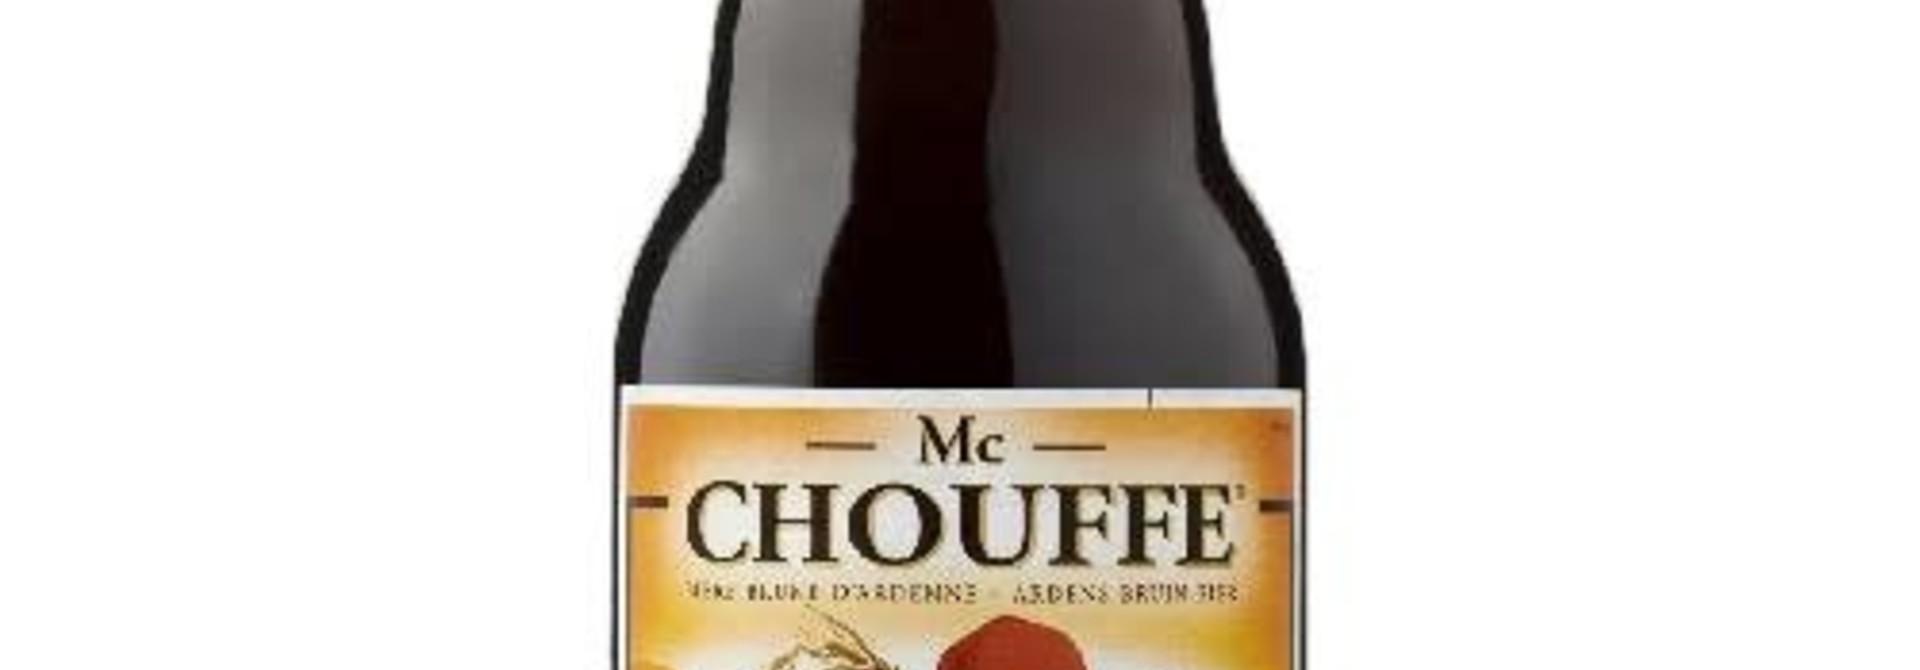 MC CHOUFFE 33CL